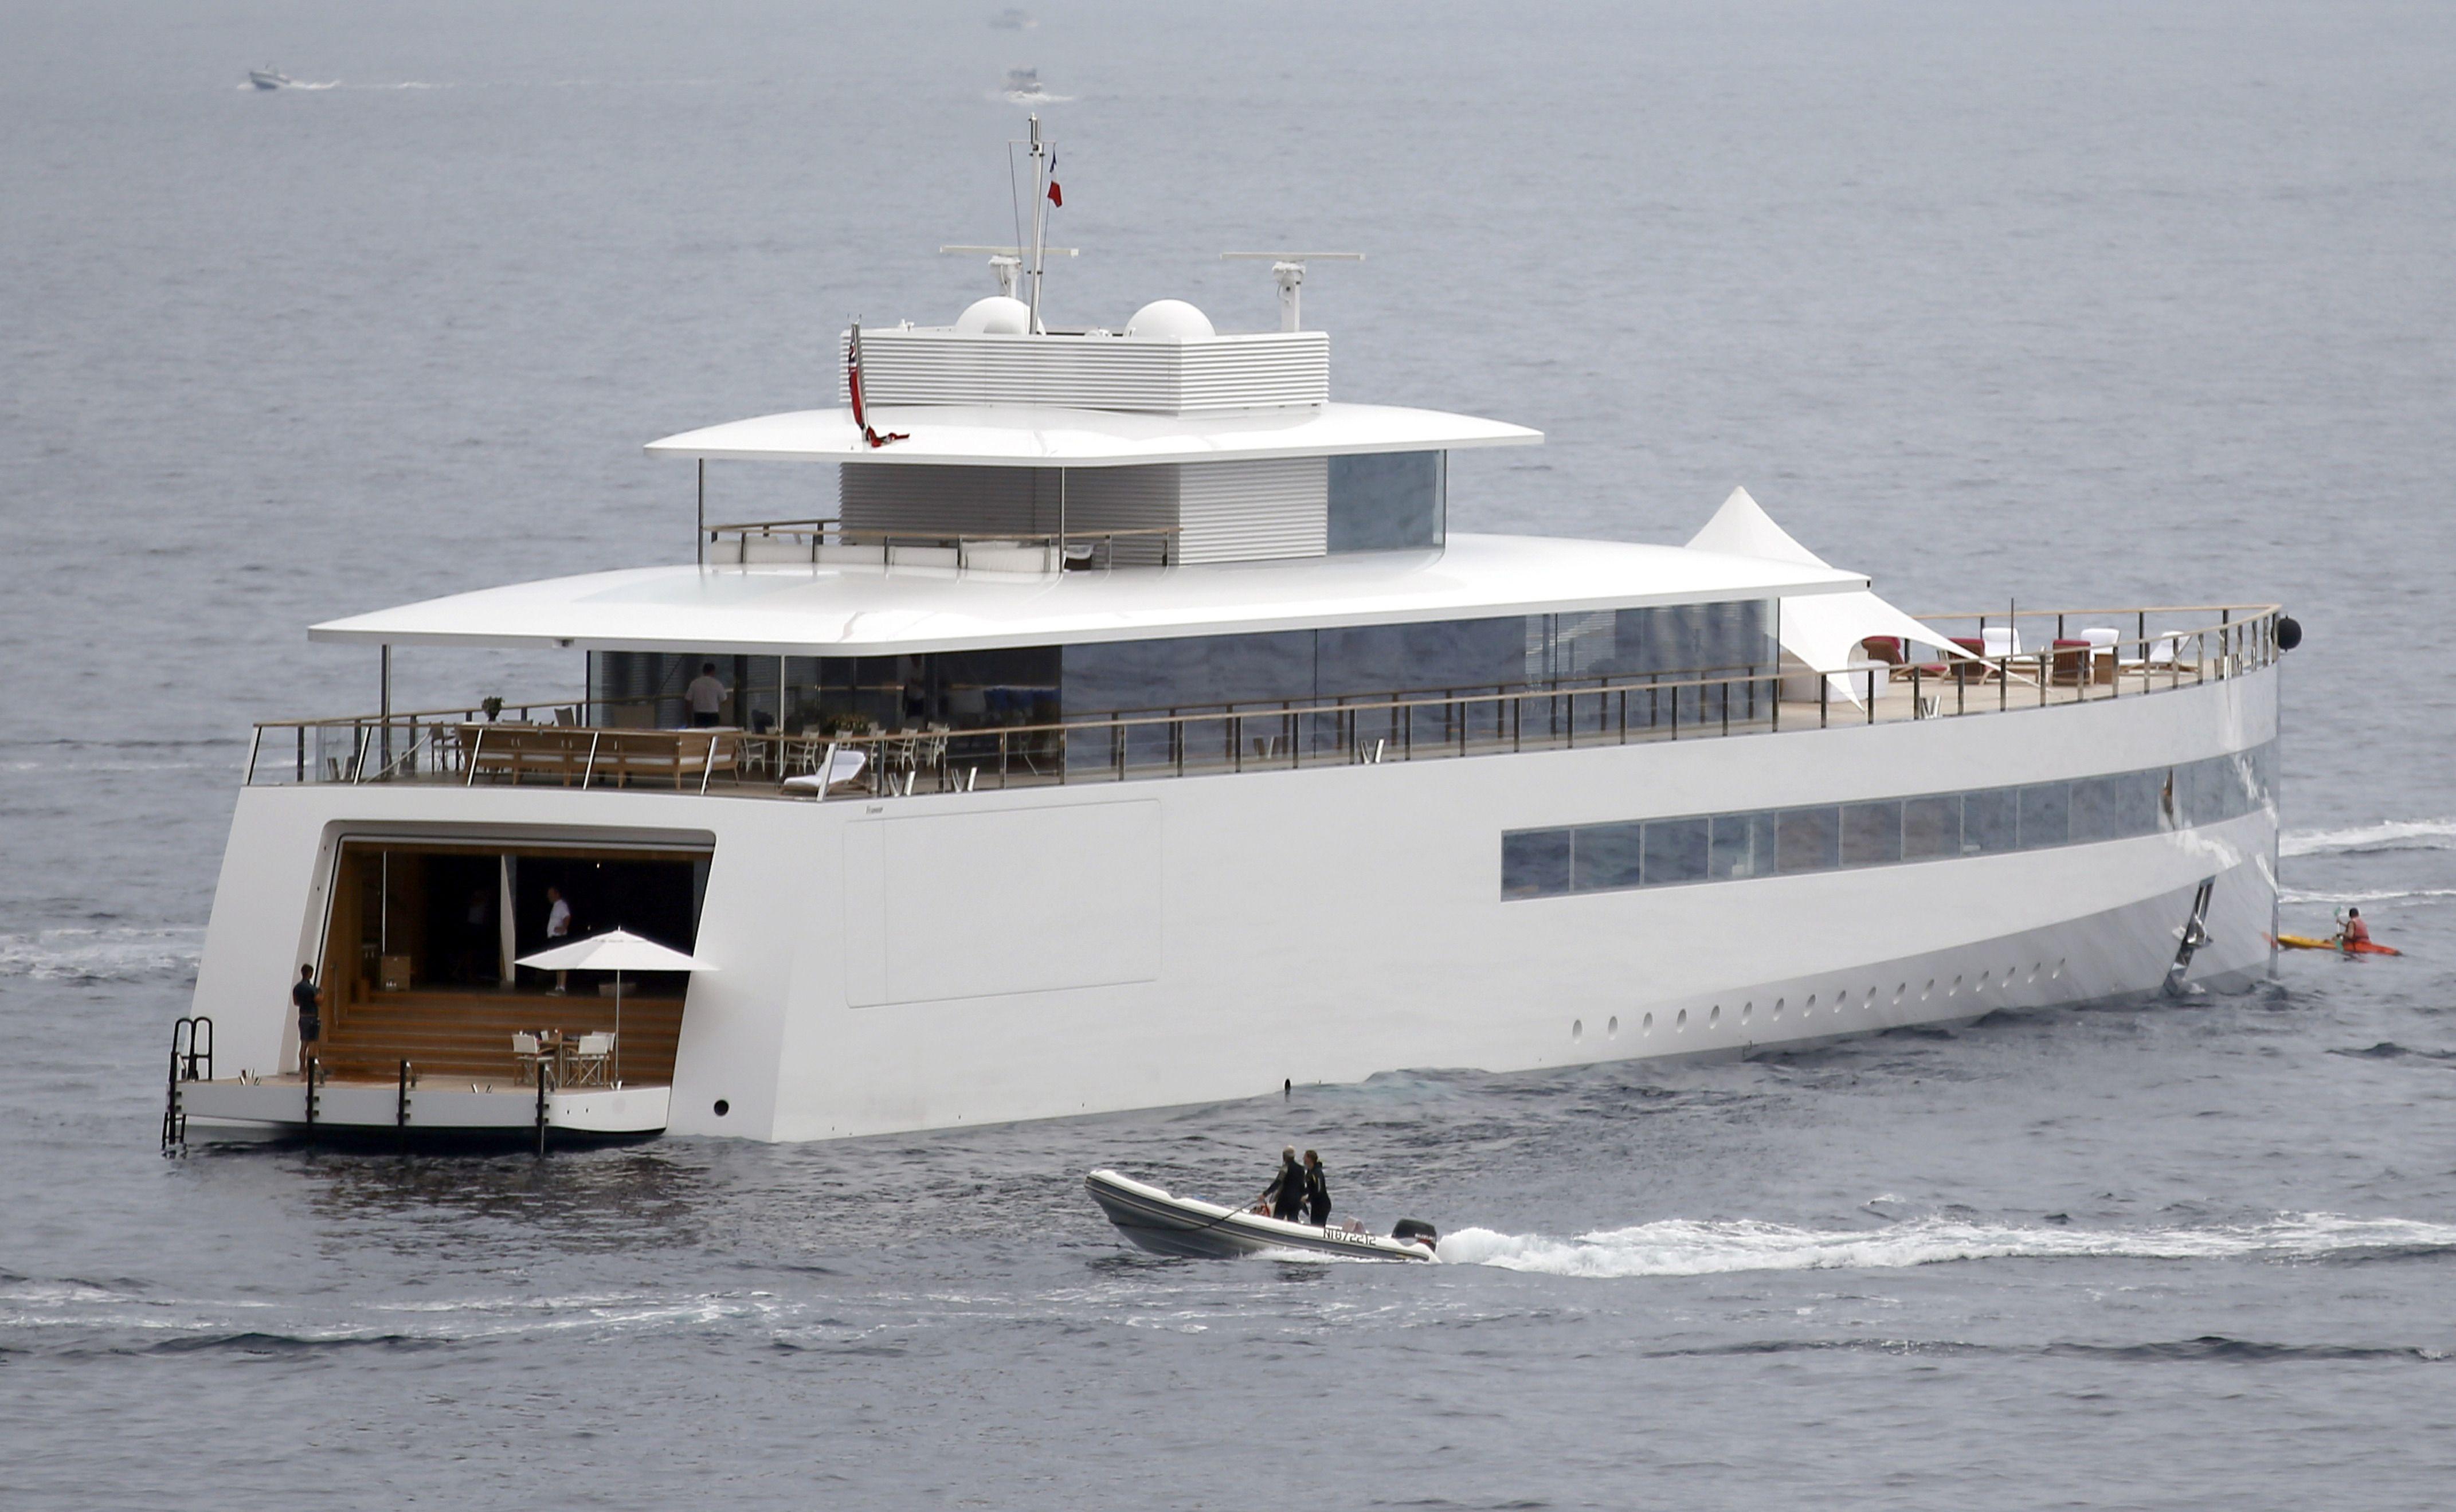 VENUS the super yacht of Steve Jobs. Cost 136,5 million ...